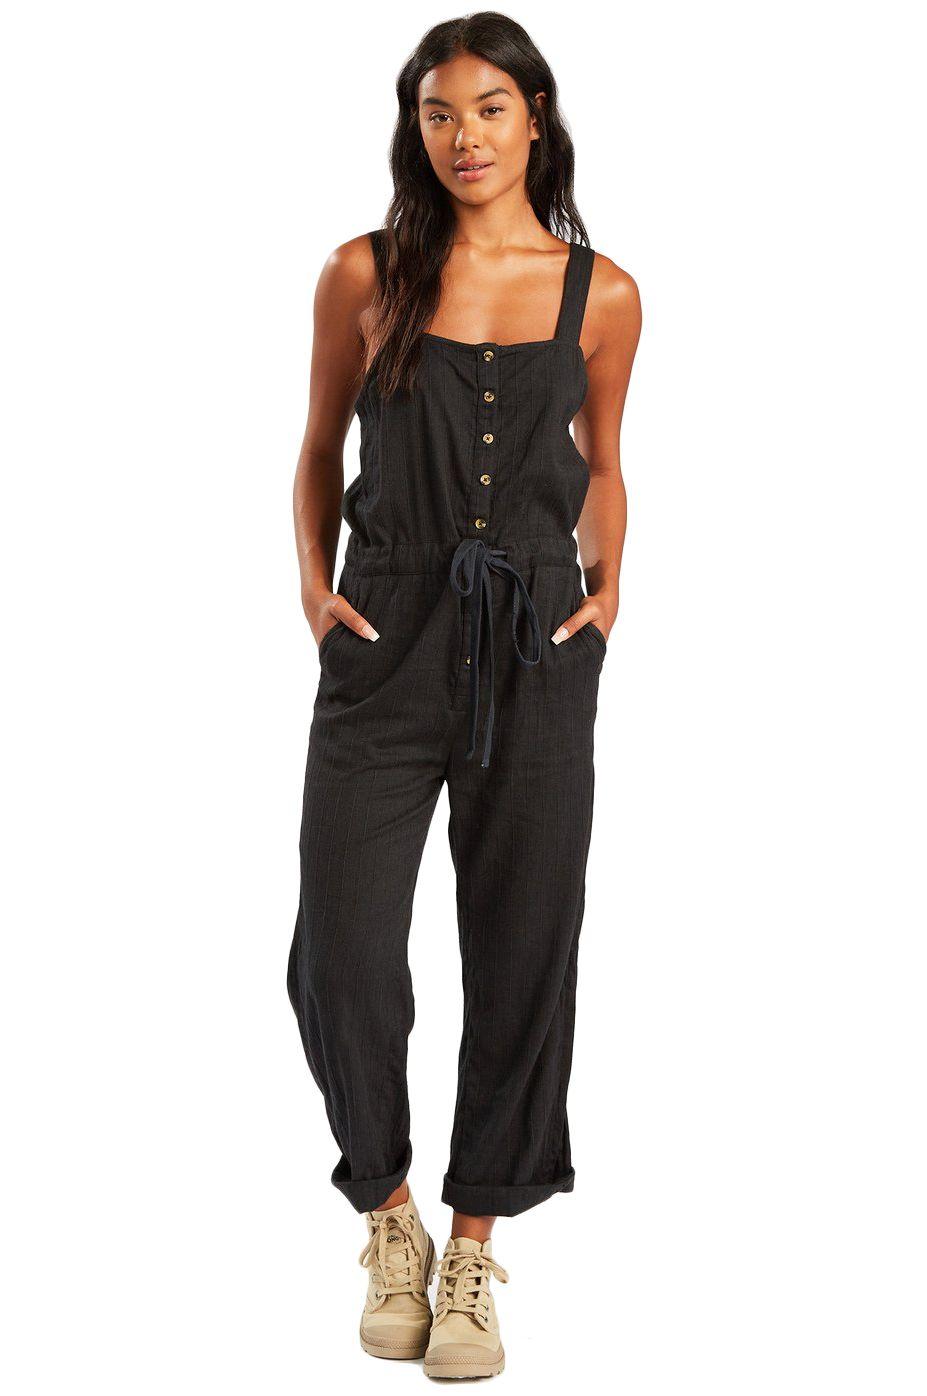 Billabong Jumpsuit SANDY SHORES A DAY DREAM AWAY Black